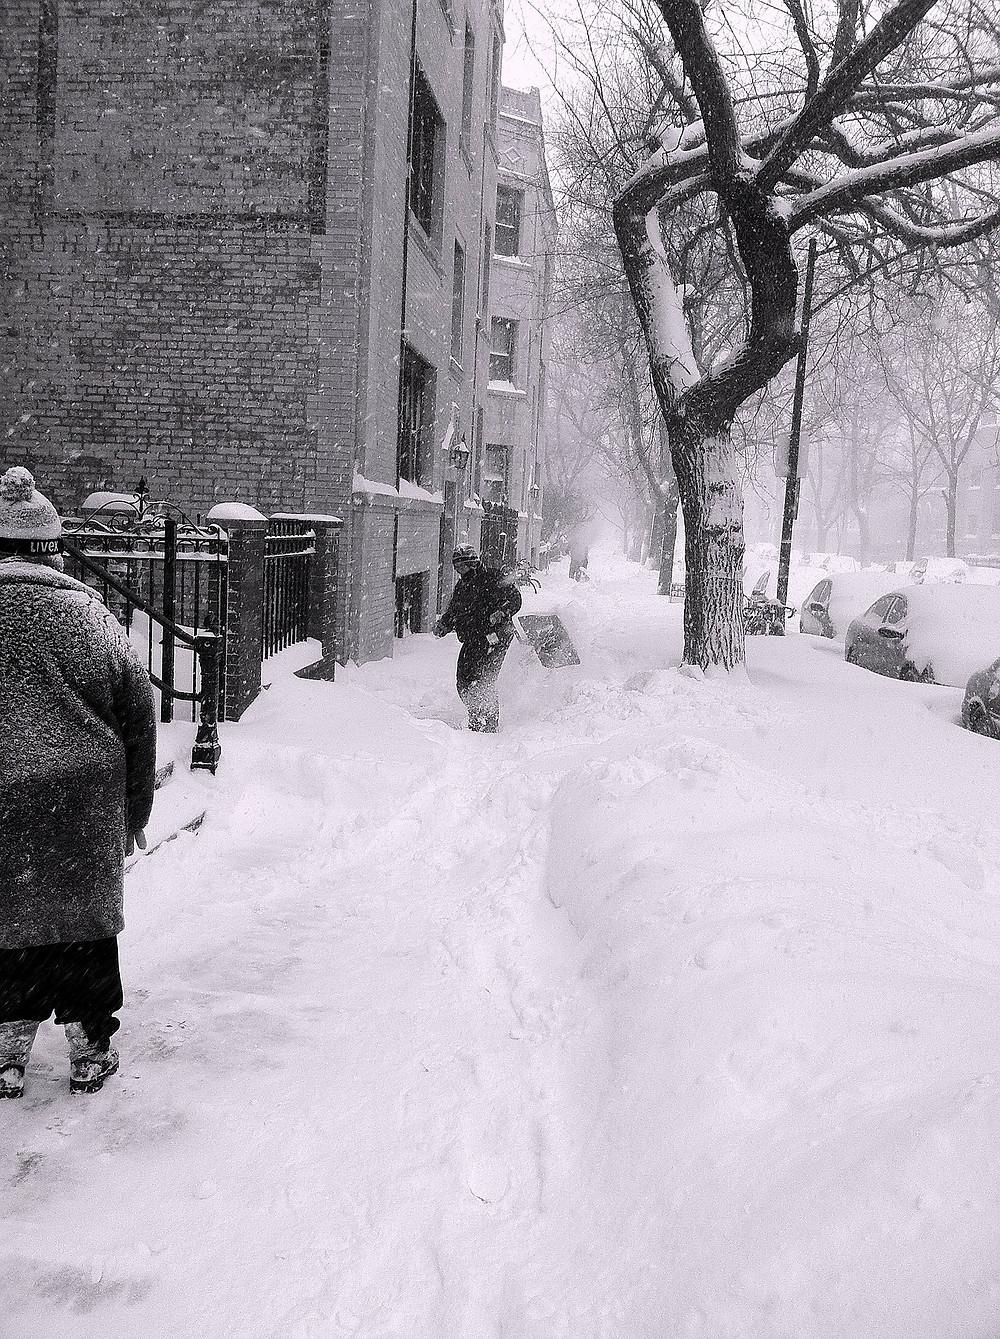 Snow removal of city sidewalk in the Durham Region